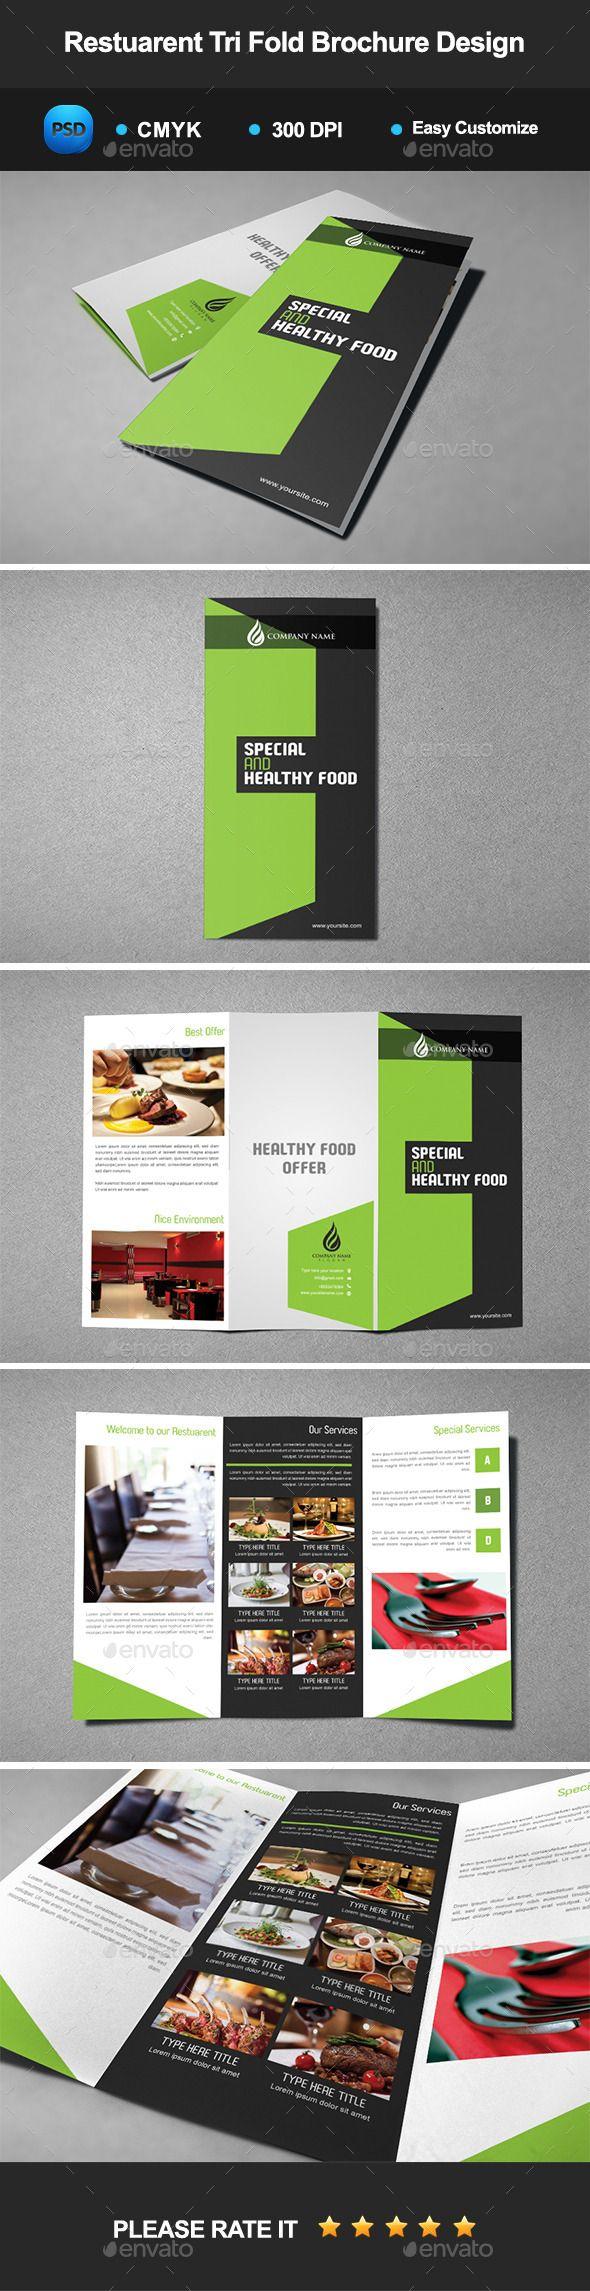 Creative Modern Corporate Brochure Design: Restaurant Tri Fold Brochure Design